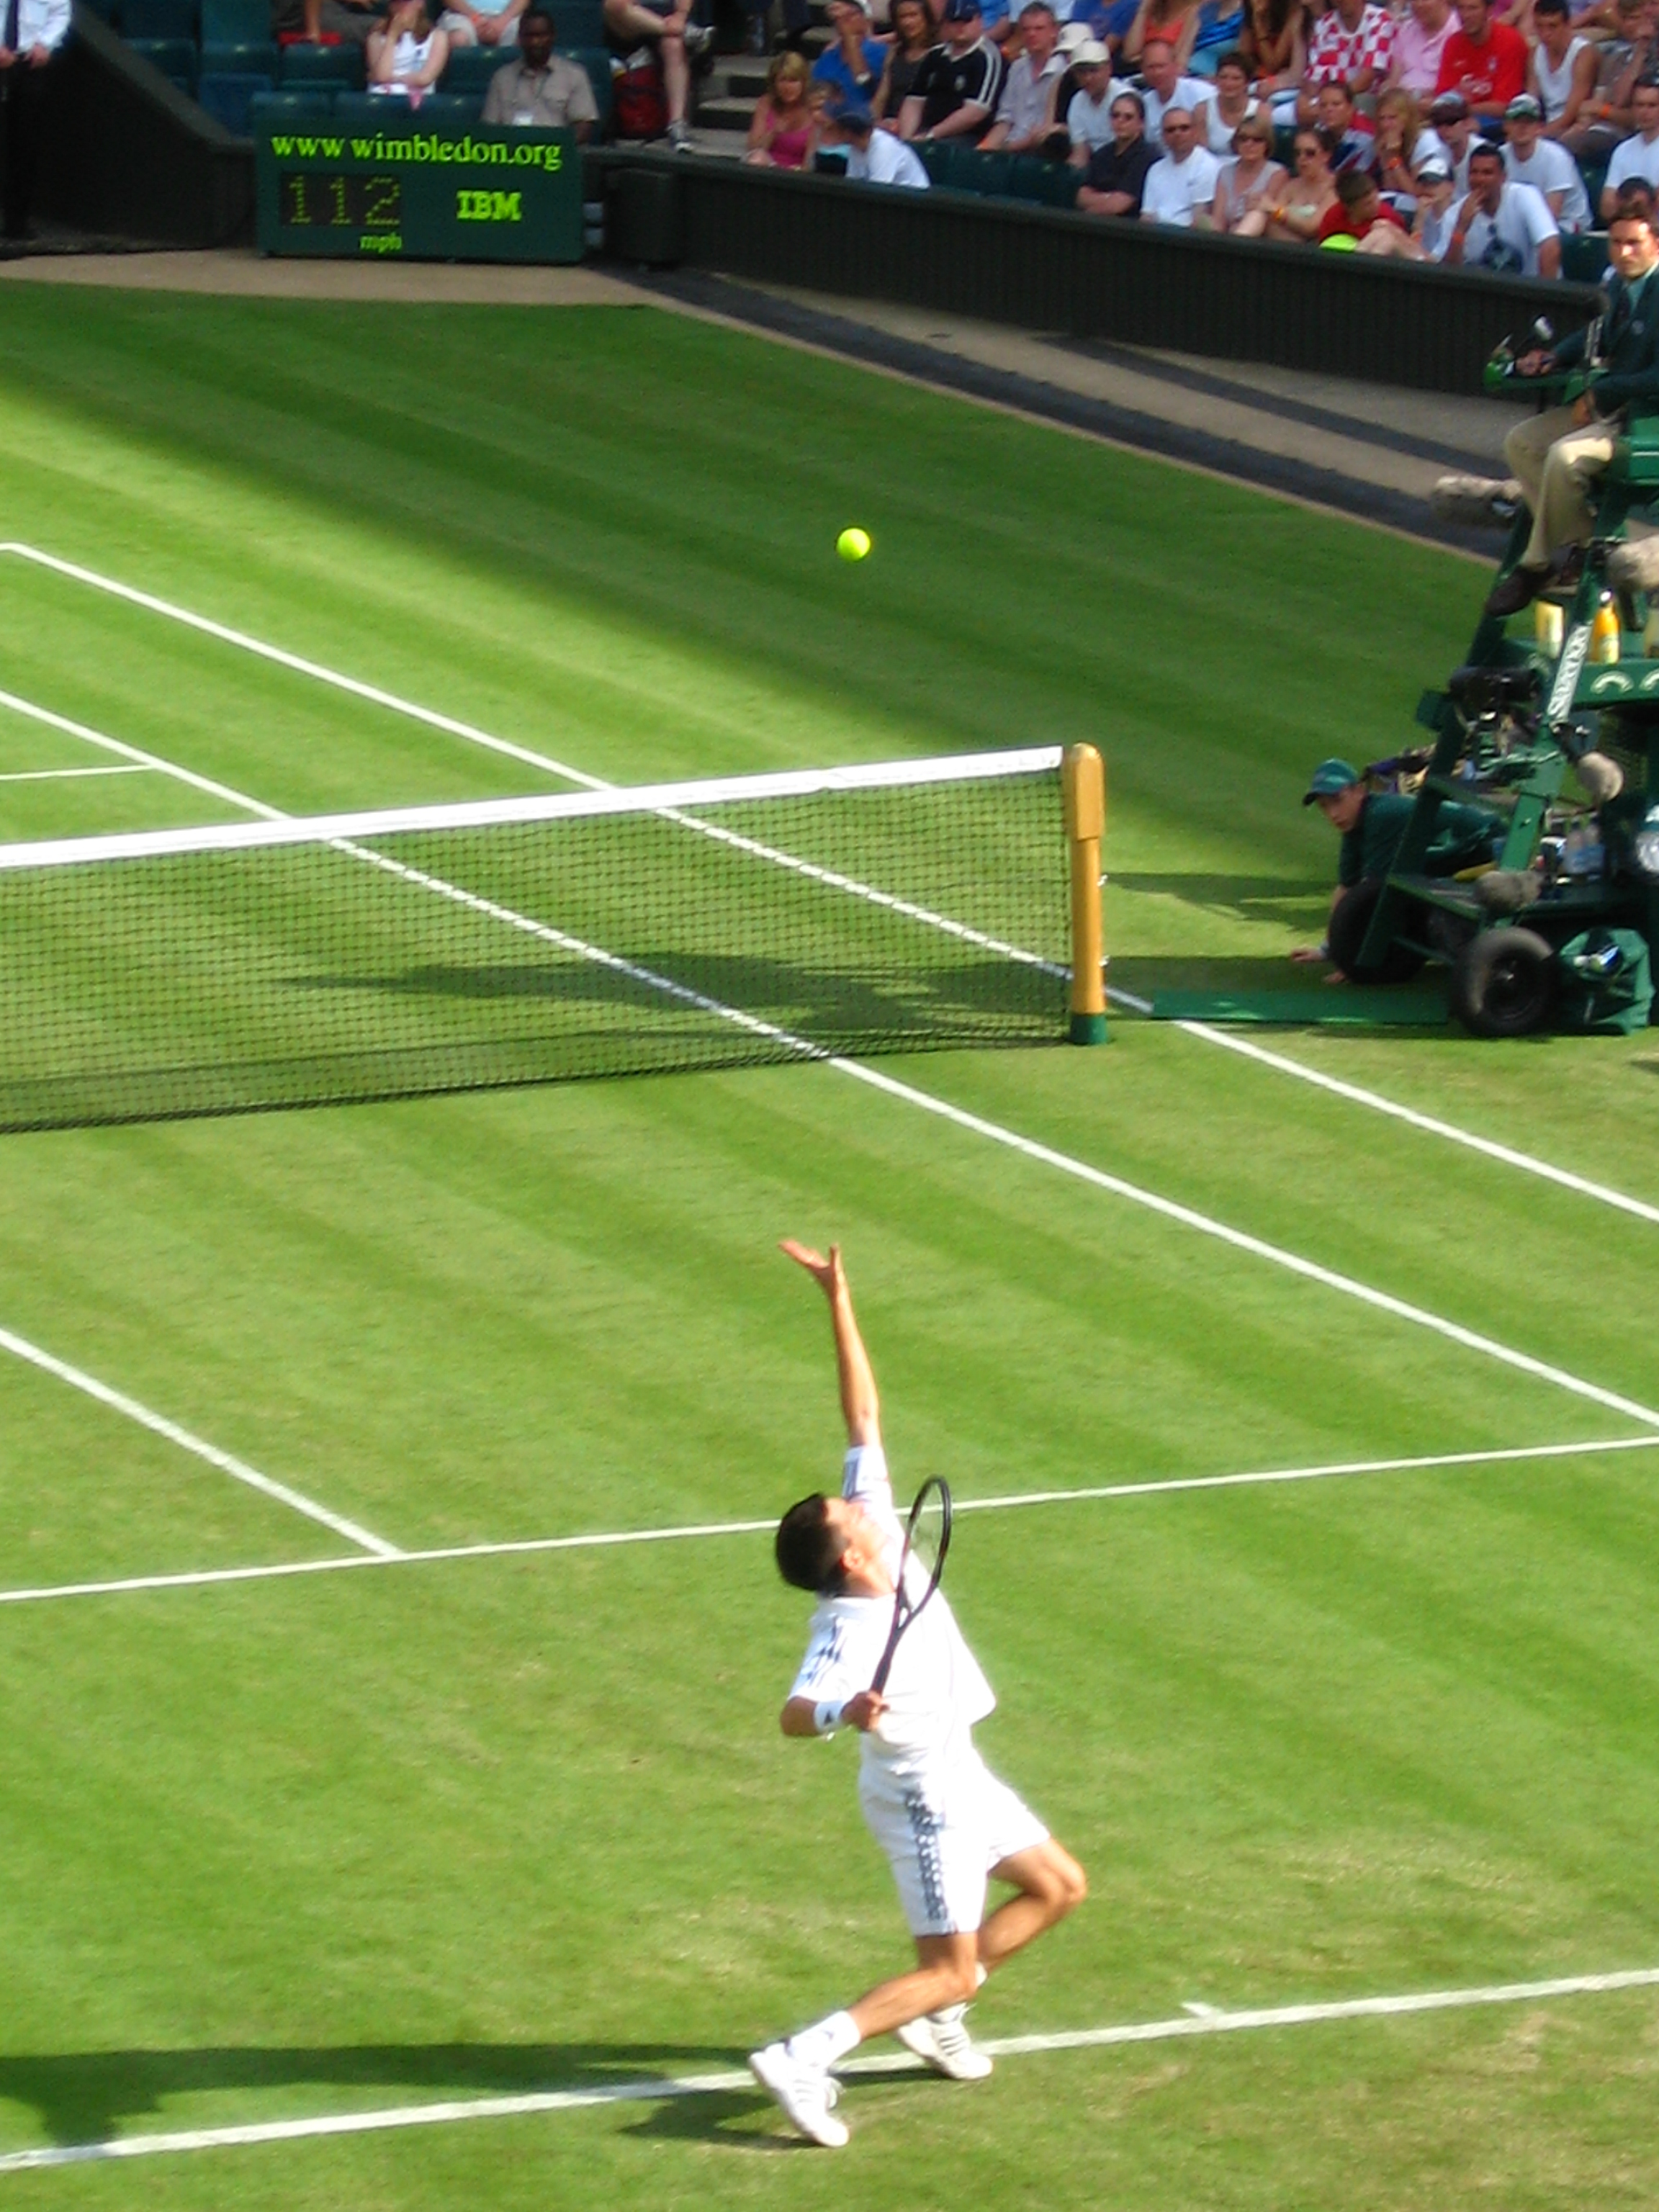 File:Tim Henman Wimbledon 2005 1.jpg - Wikimedia Commons